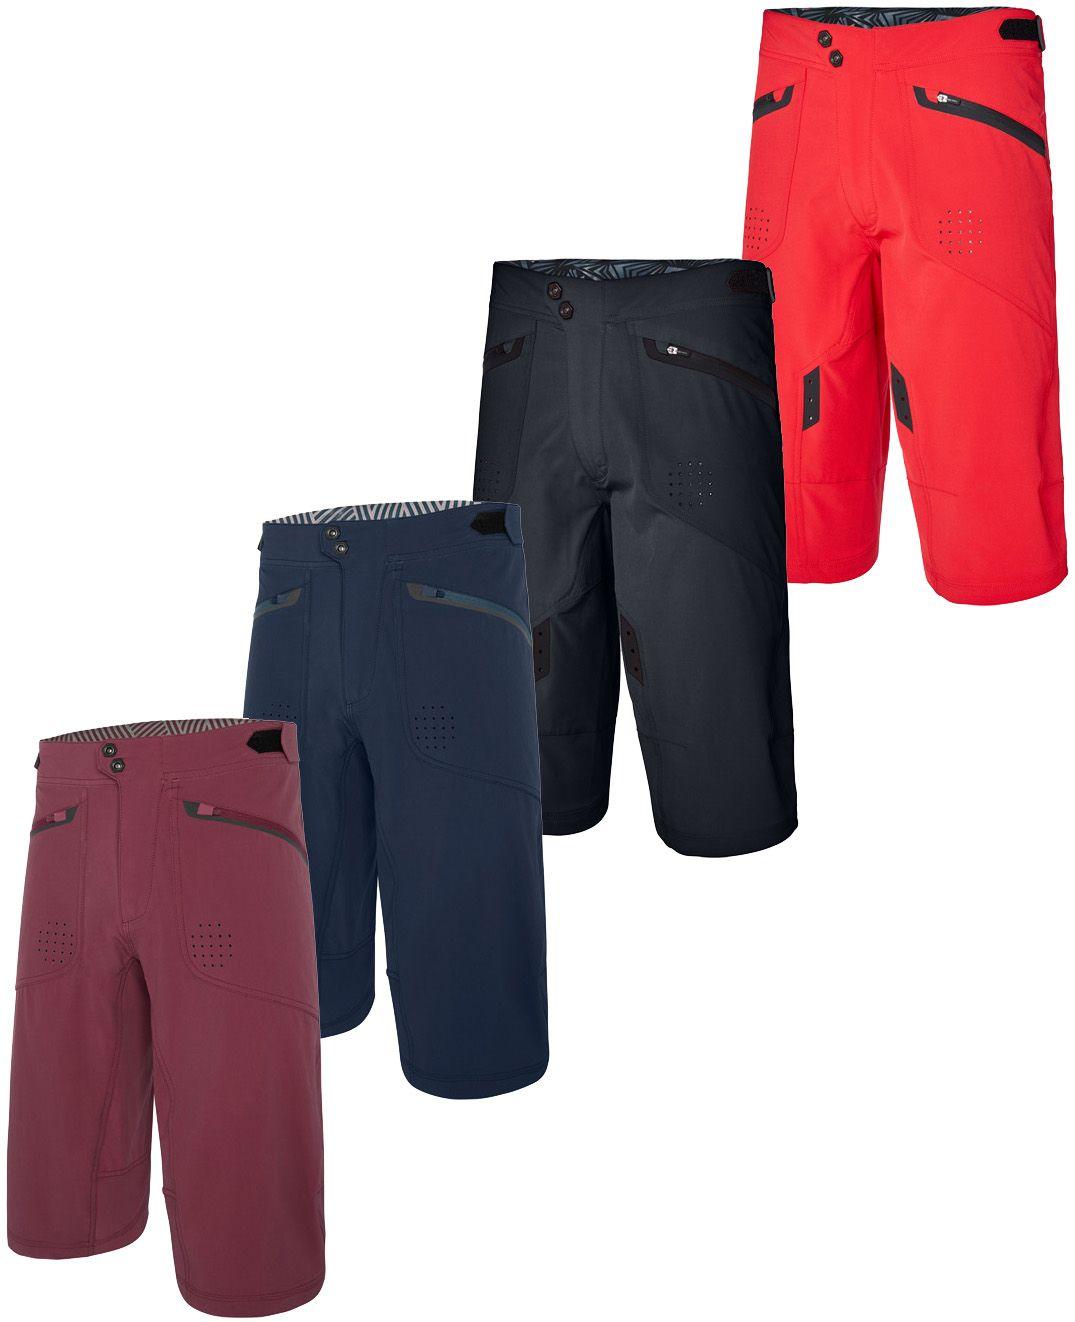 Madison Flux Enduro Shorts 2019 | Trousers